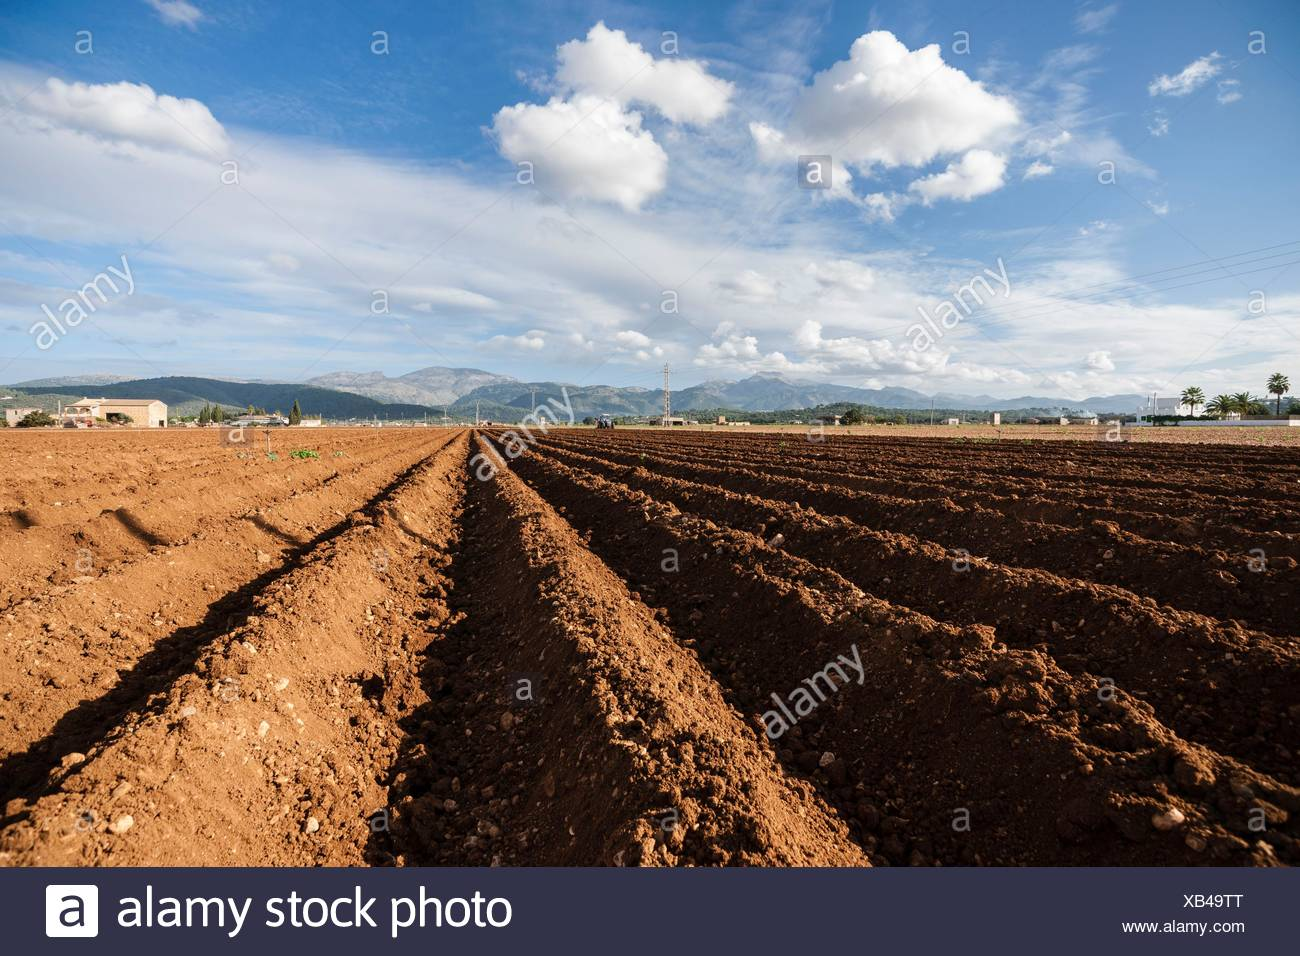 furrows of earth, Sa Pobla, county of Raiguer, Mallorca, Balearic Islands, Spain. - Stock Image